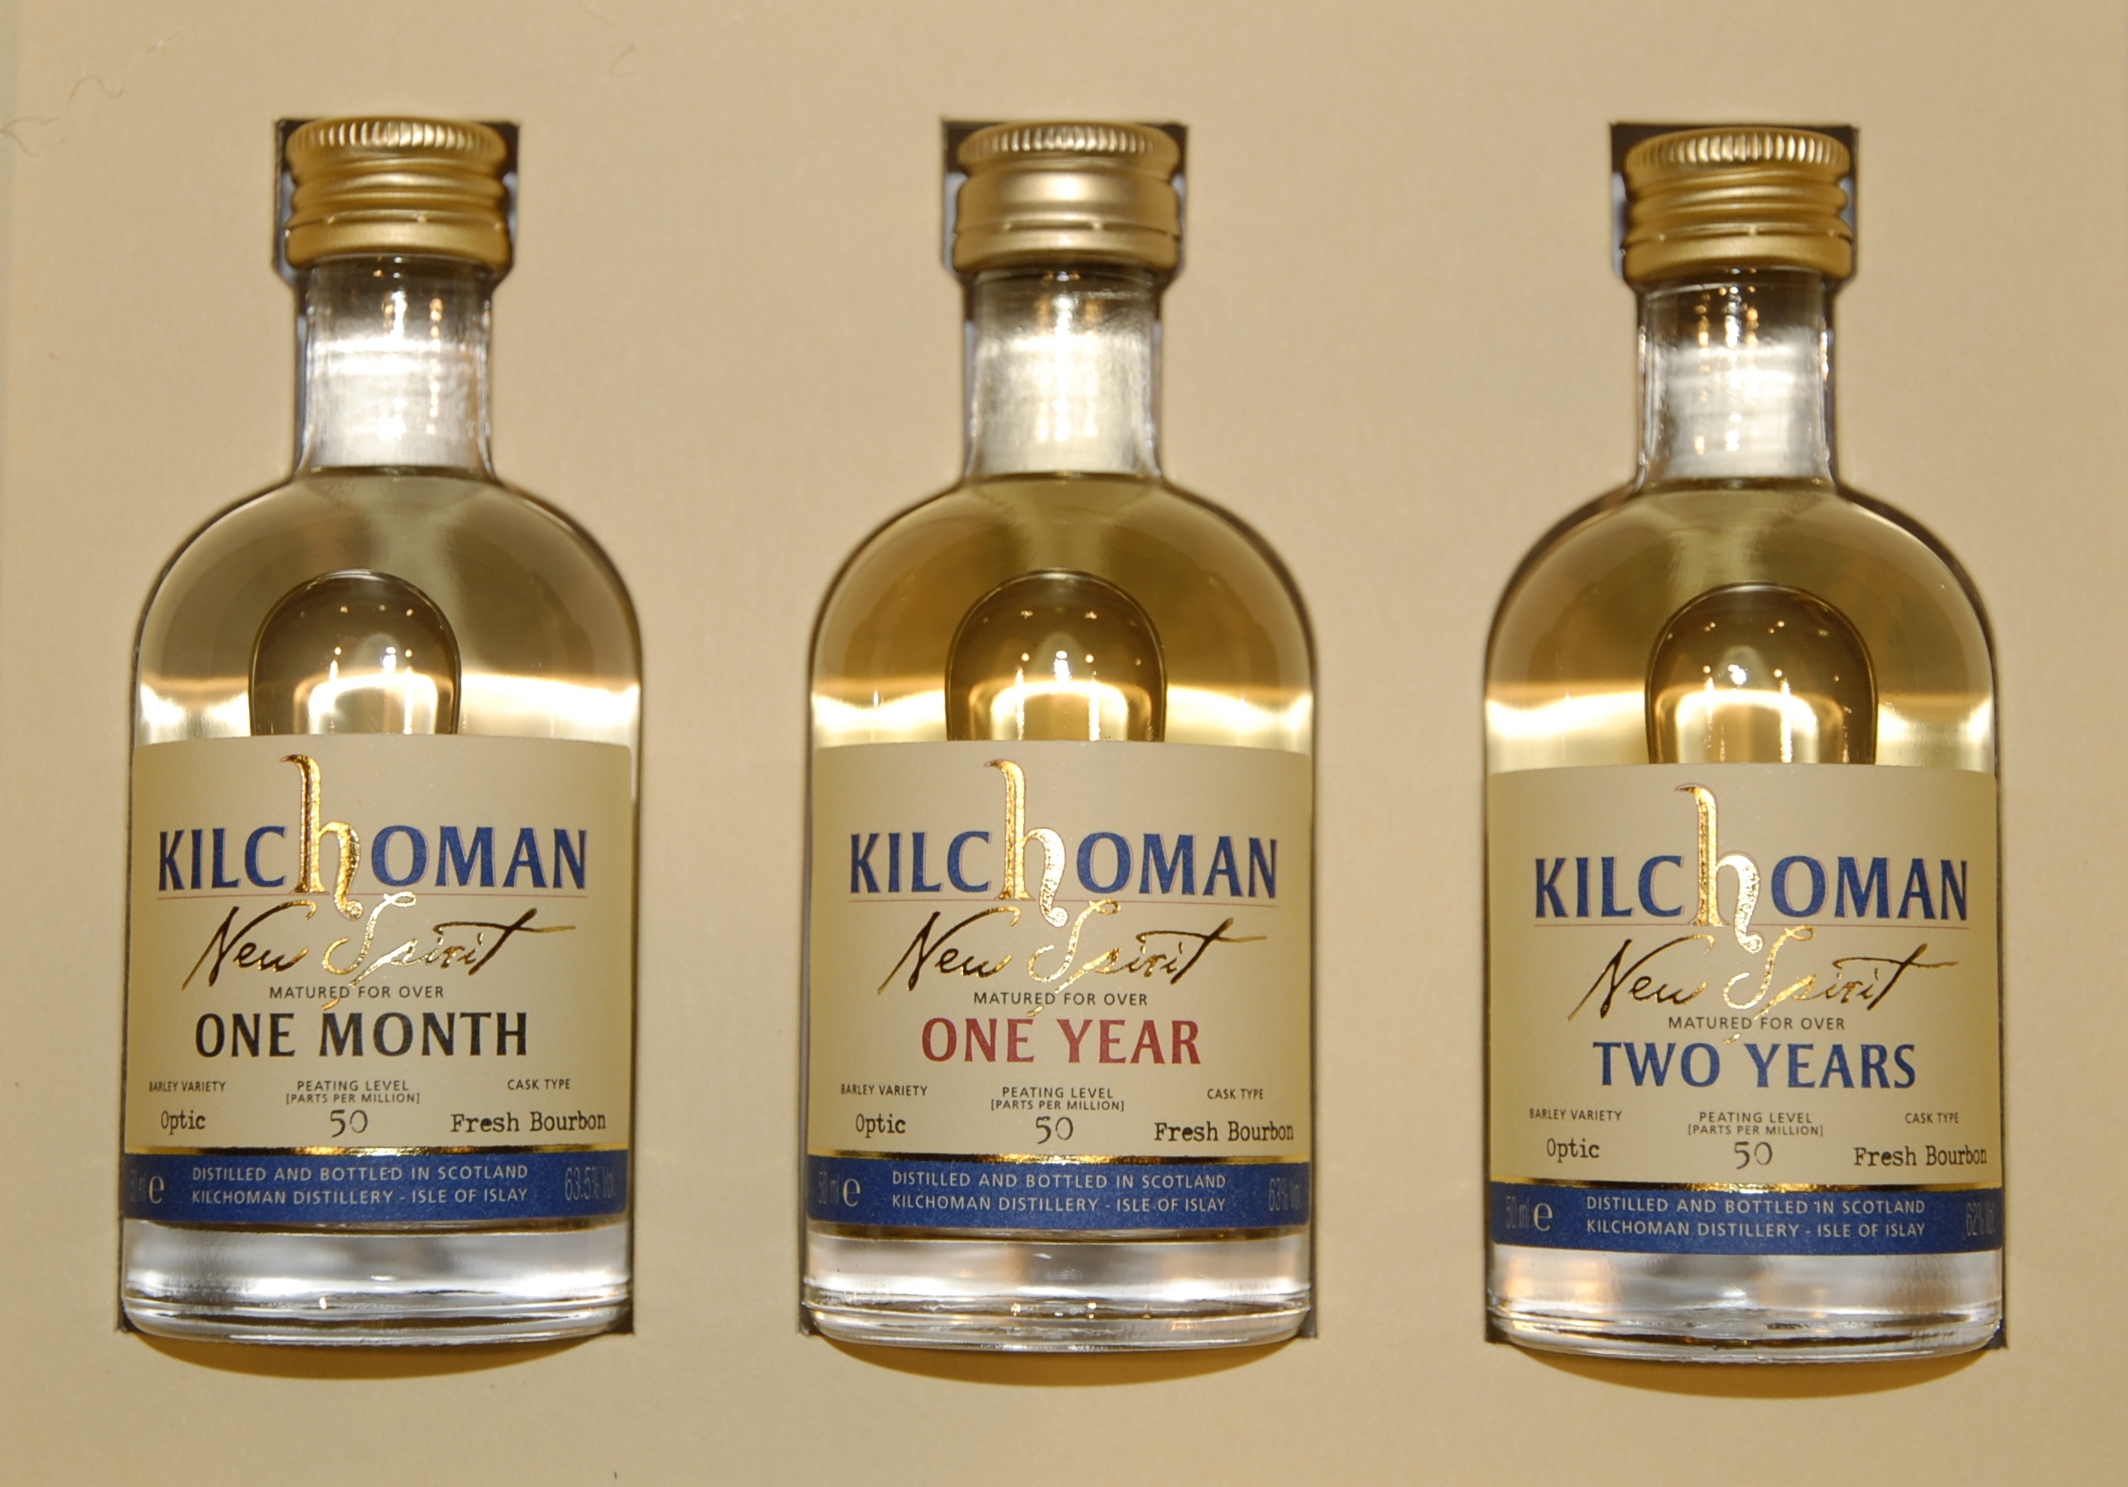 Kilchoman New Spirit bottles